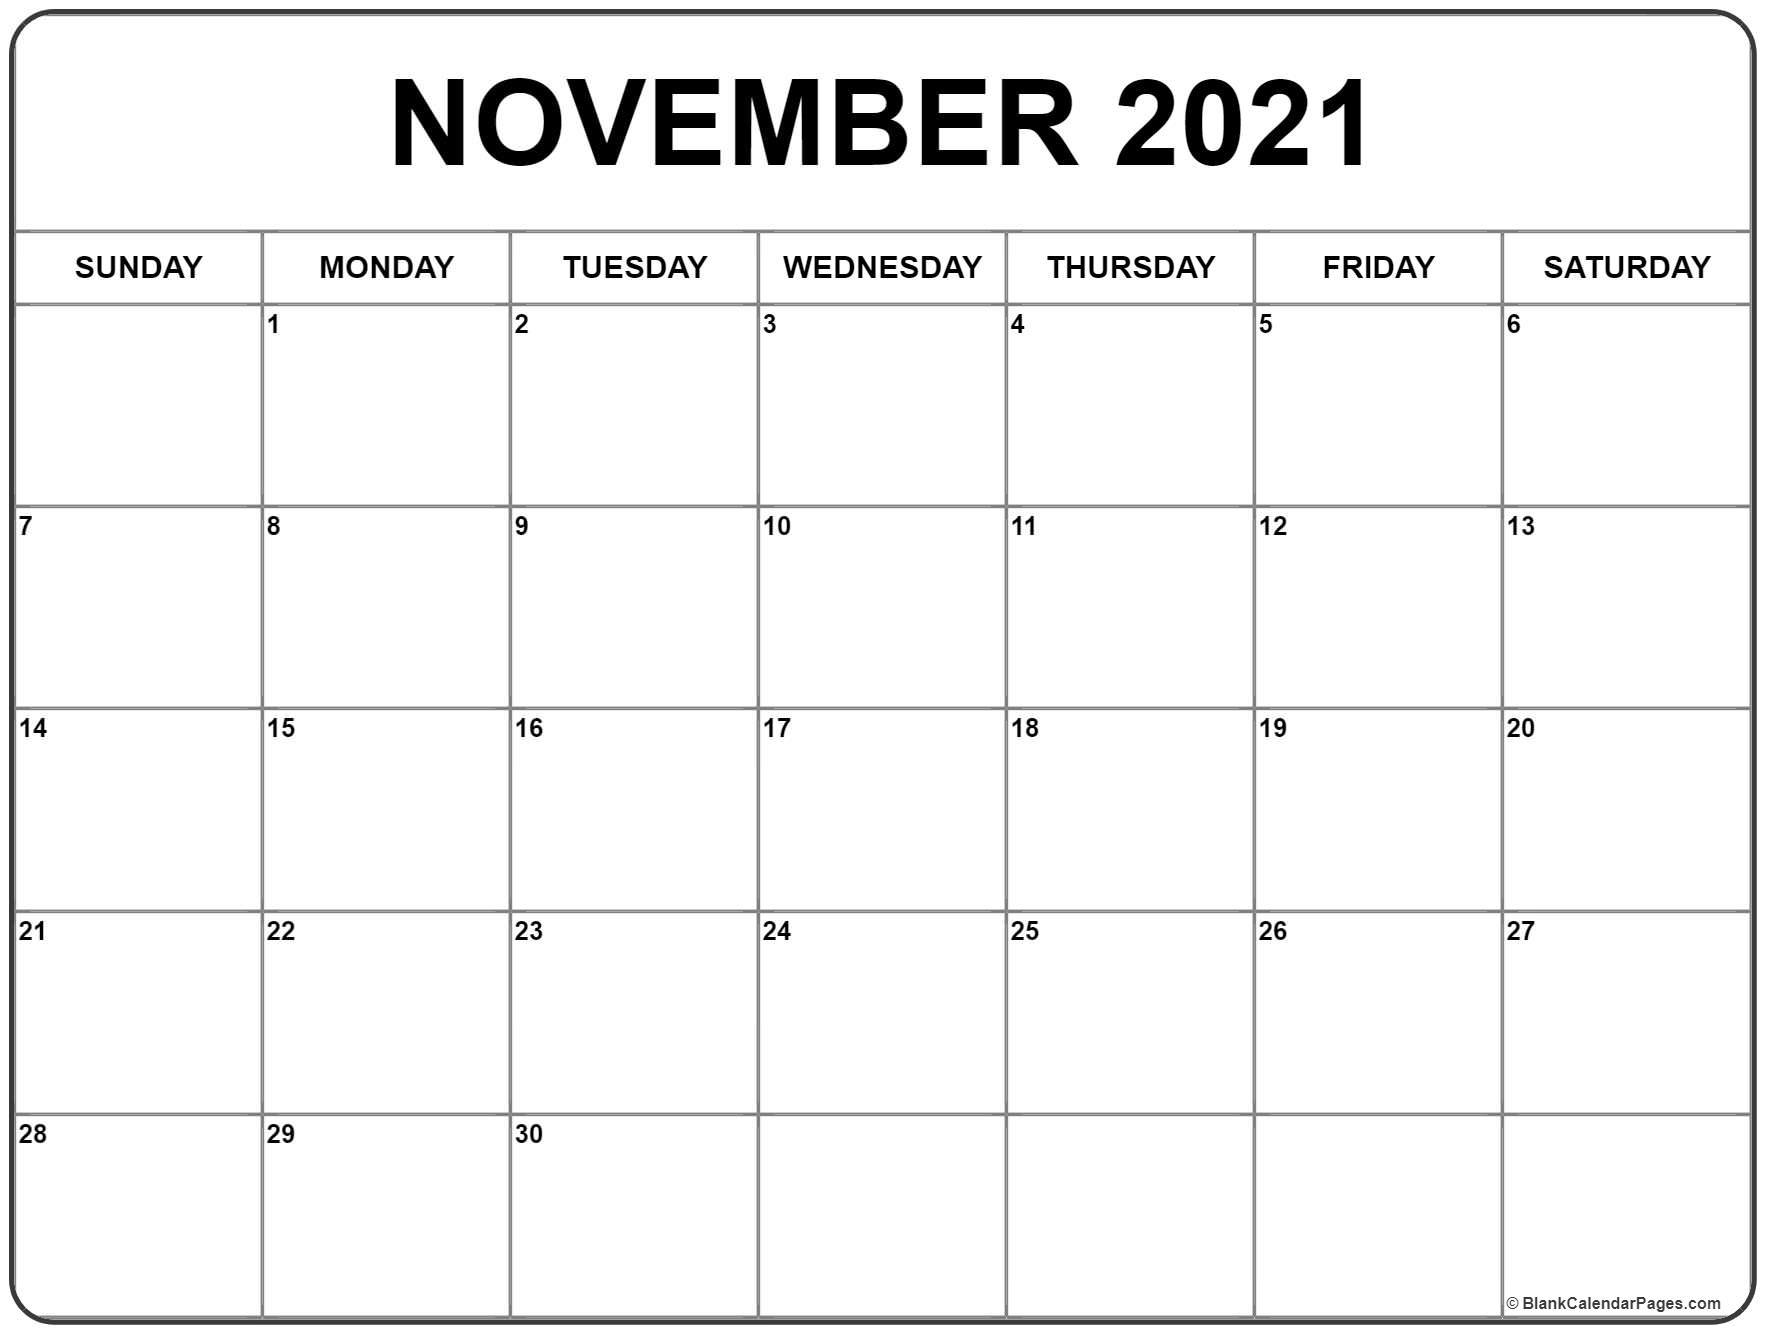 November 2021 Calendar | Free Printable Monthly Calendars